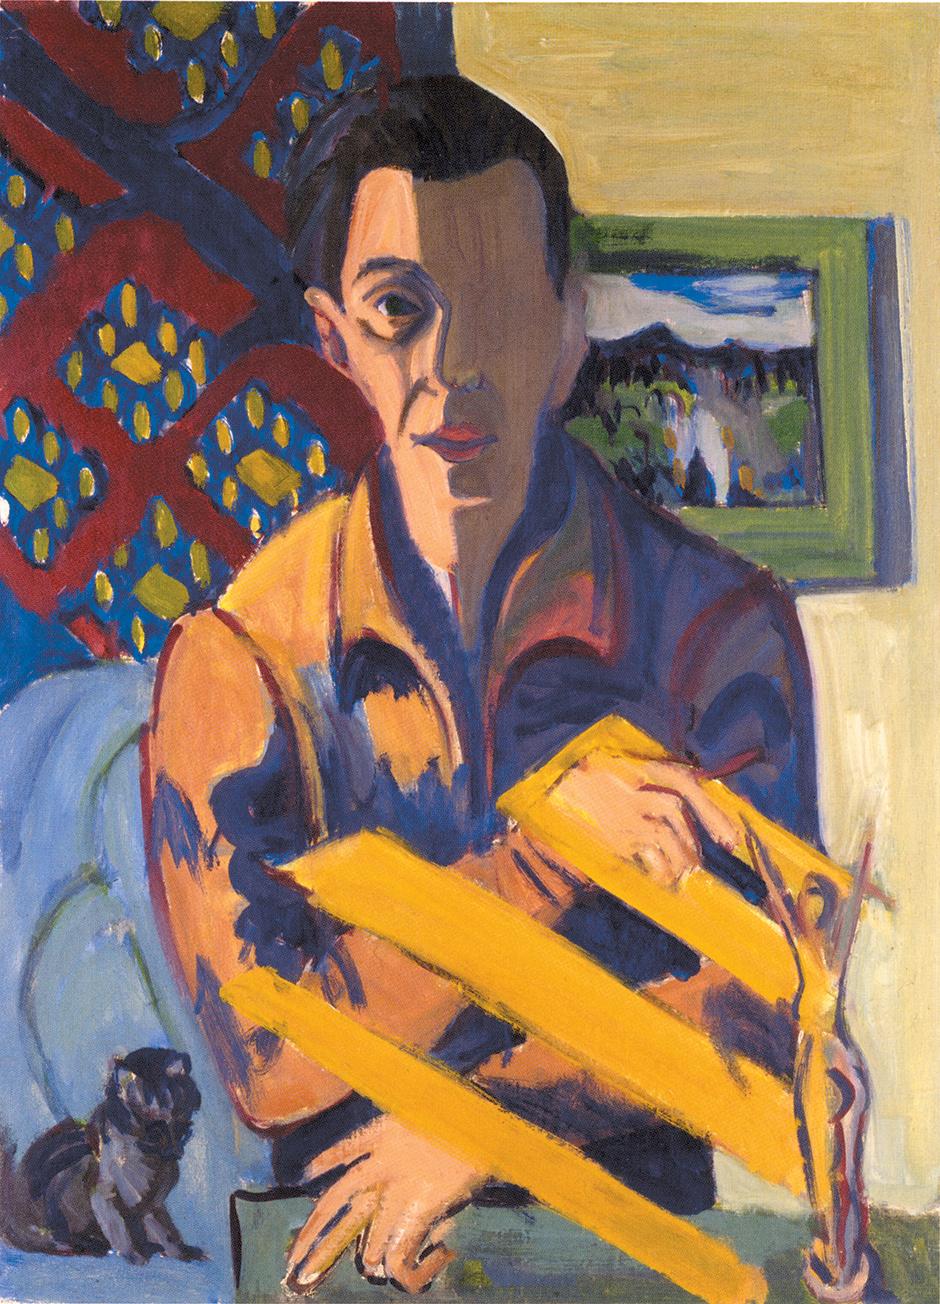 Ernst Ludwig Kirchner: Self-Portrait, 1934/1937